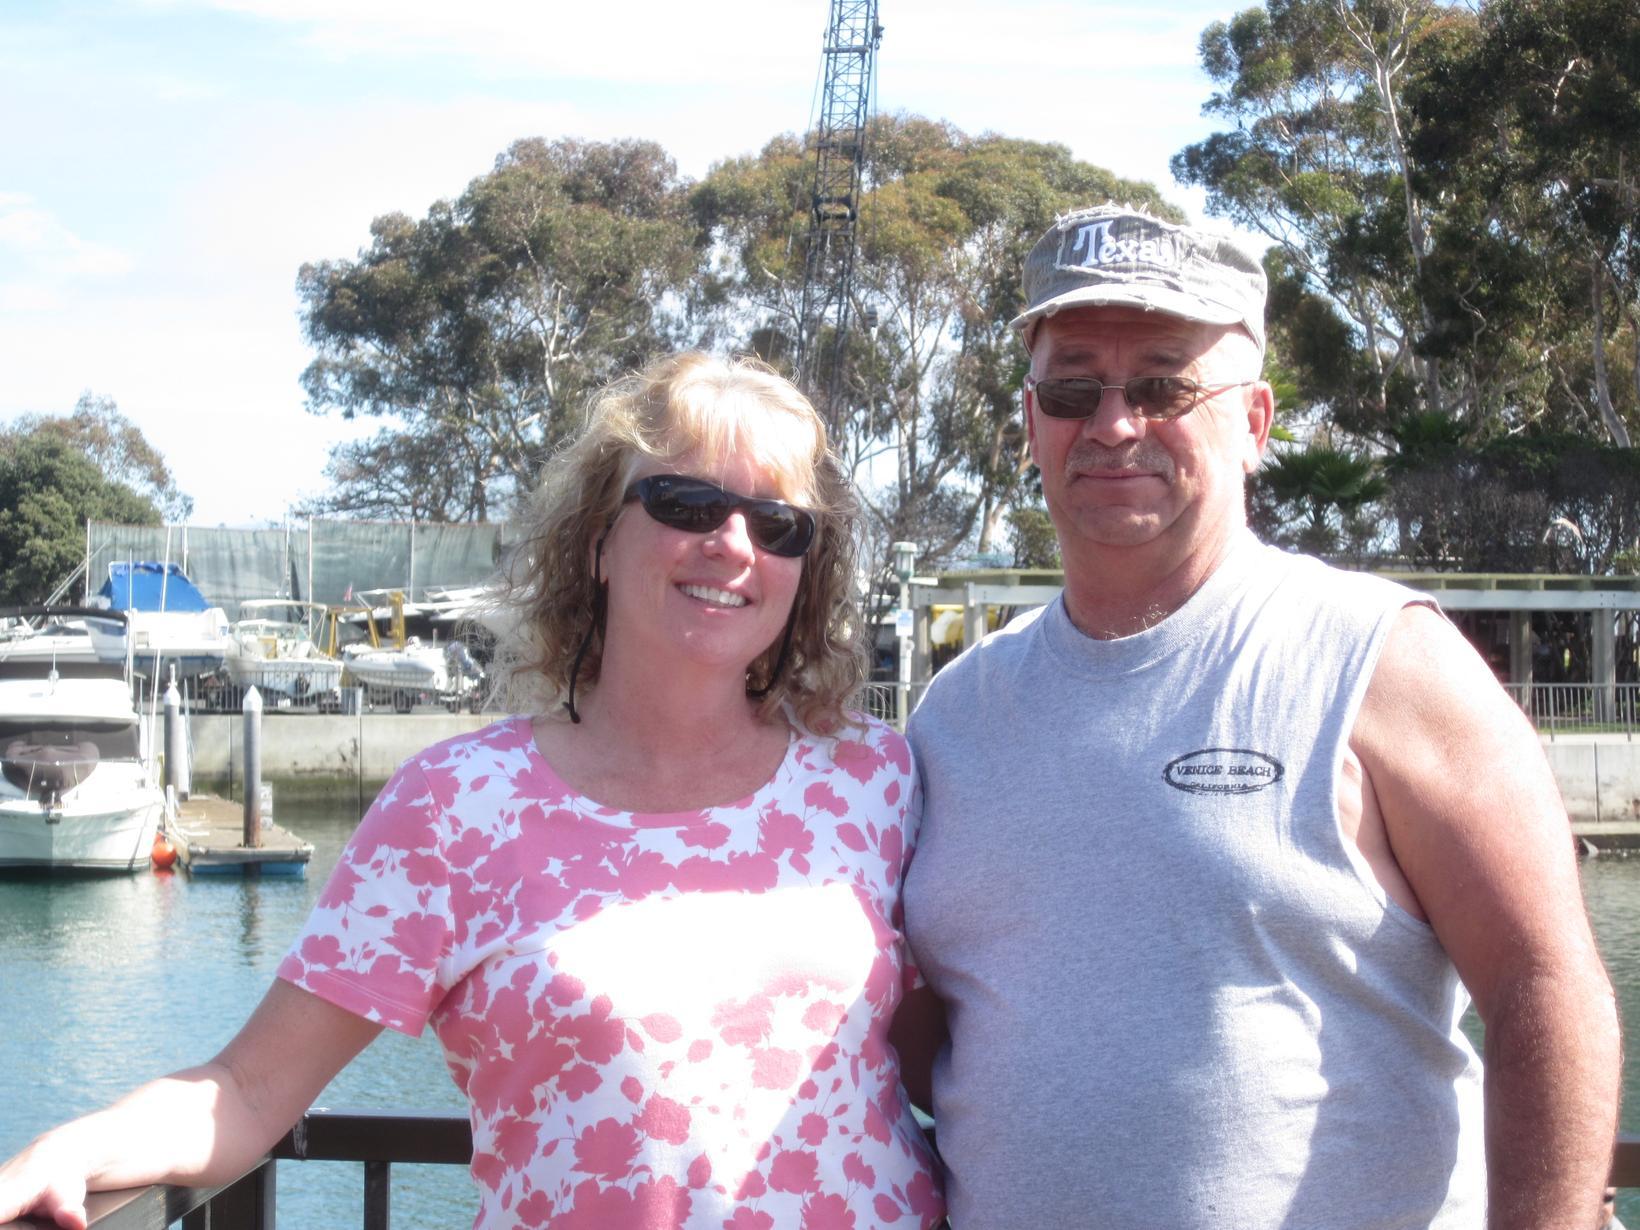 Joanne & Dennis from La Broquerie, Manitoba, Canada